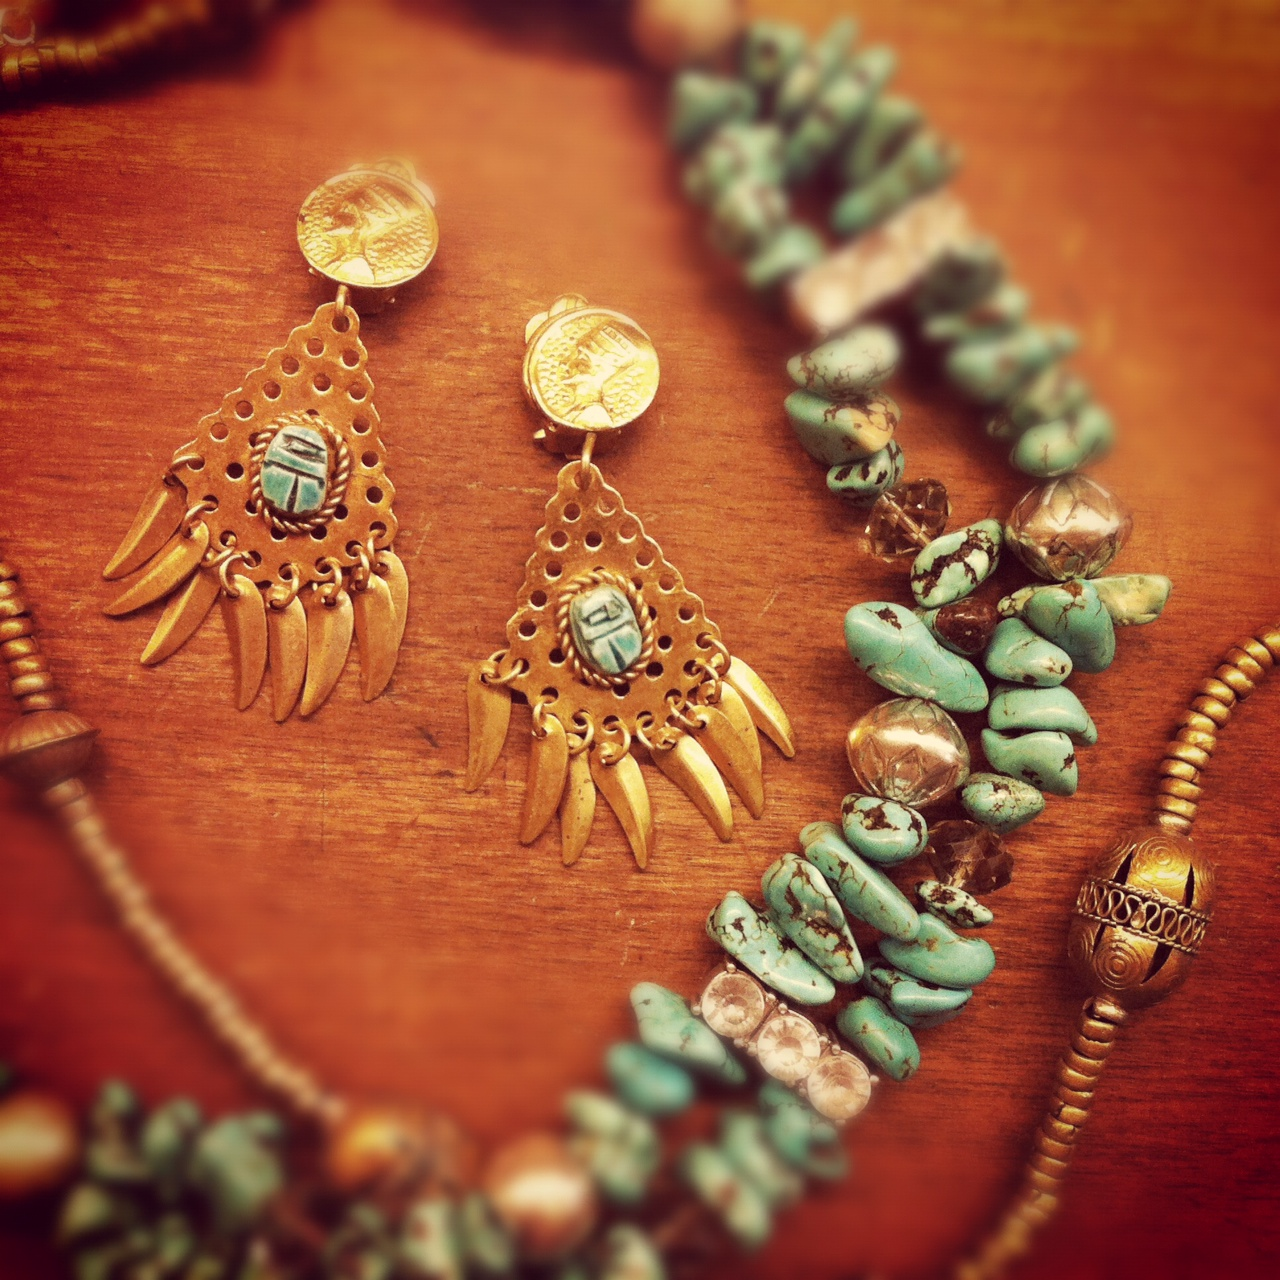 turquoise_21933660772_o.jpg